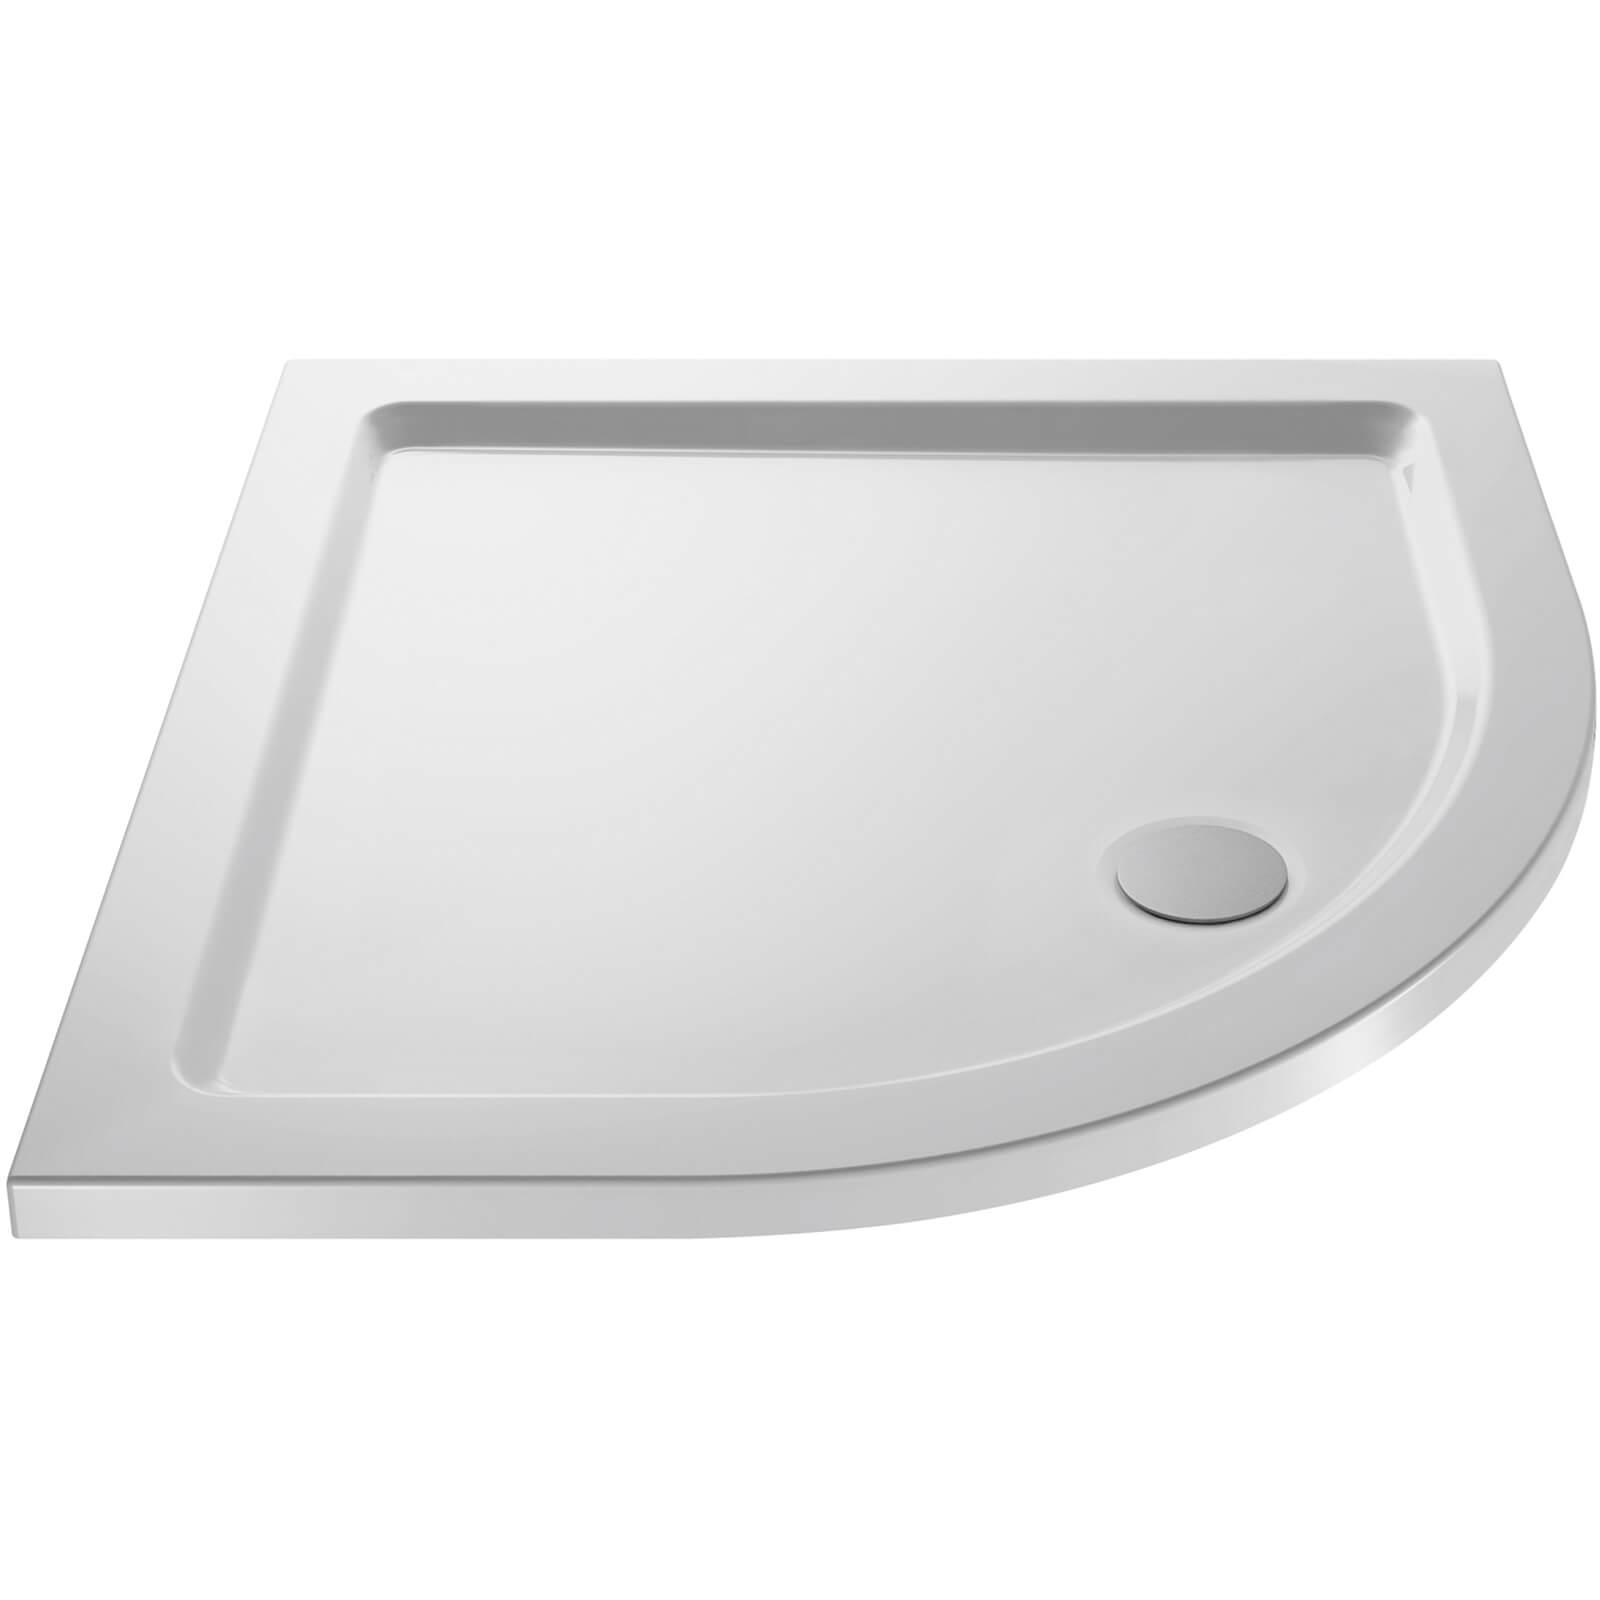 Balterley Quadrant Shower Tray - 900 x 900mm